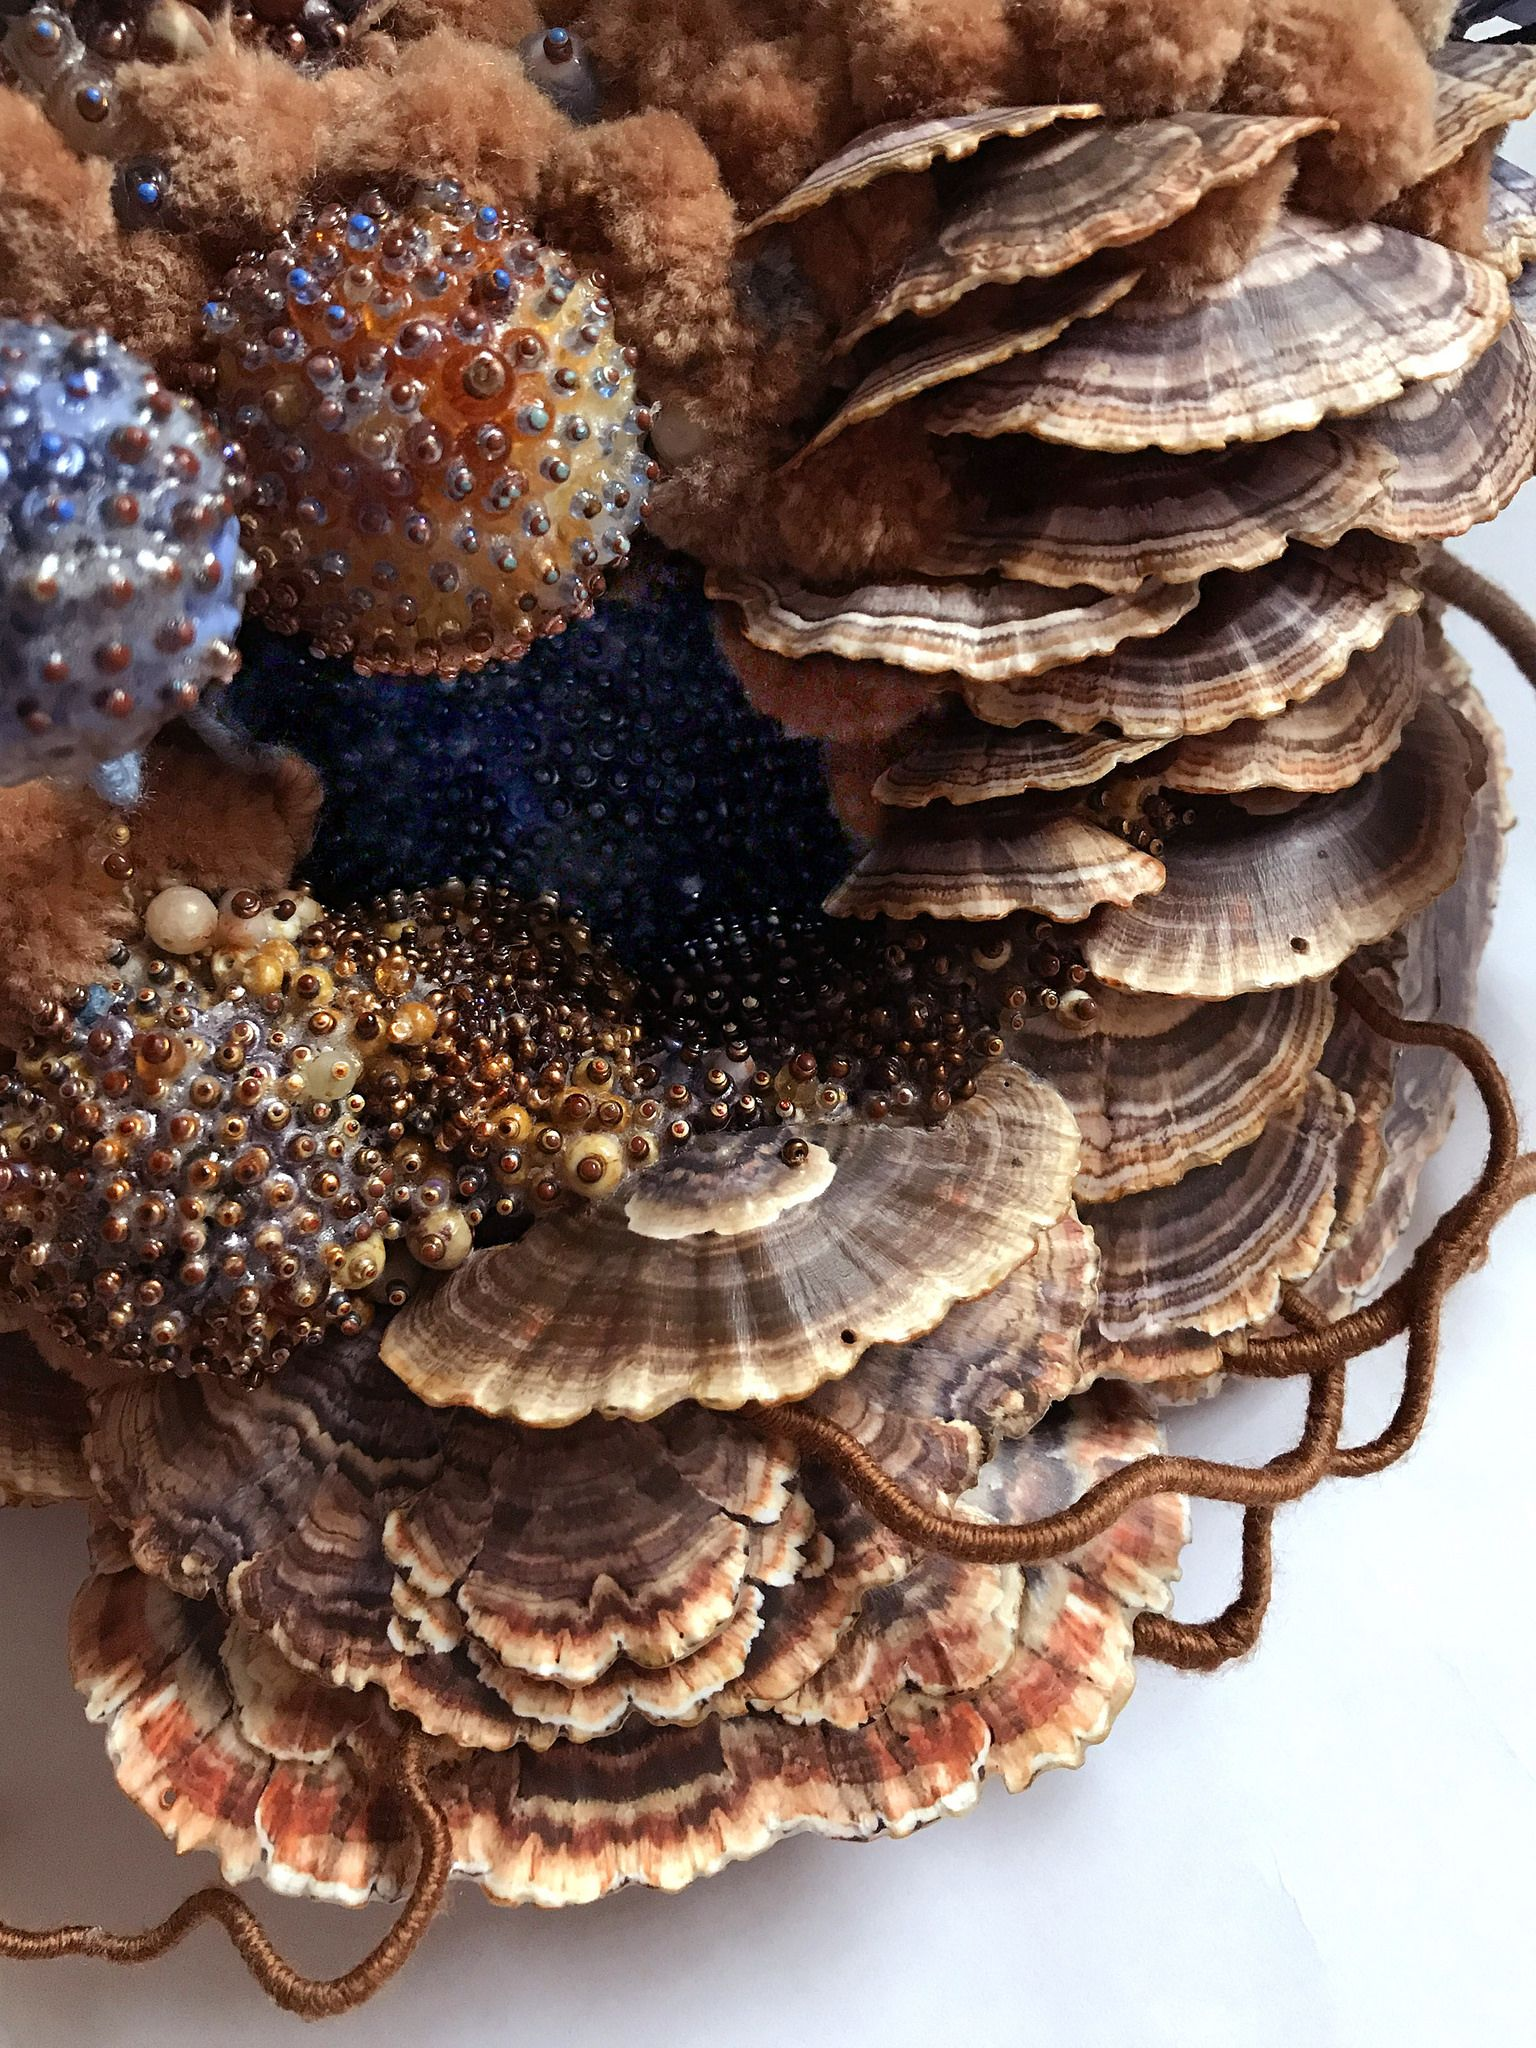 Amy Gross Tree Fungi Biotope Detail